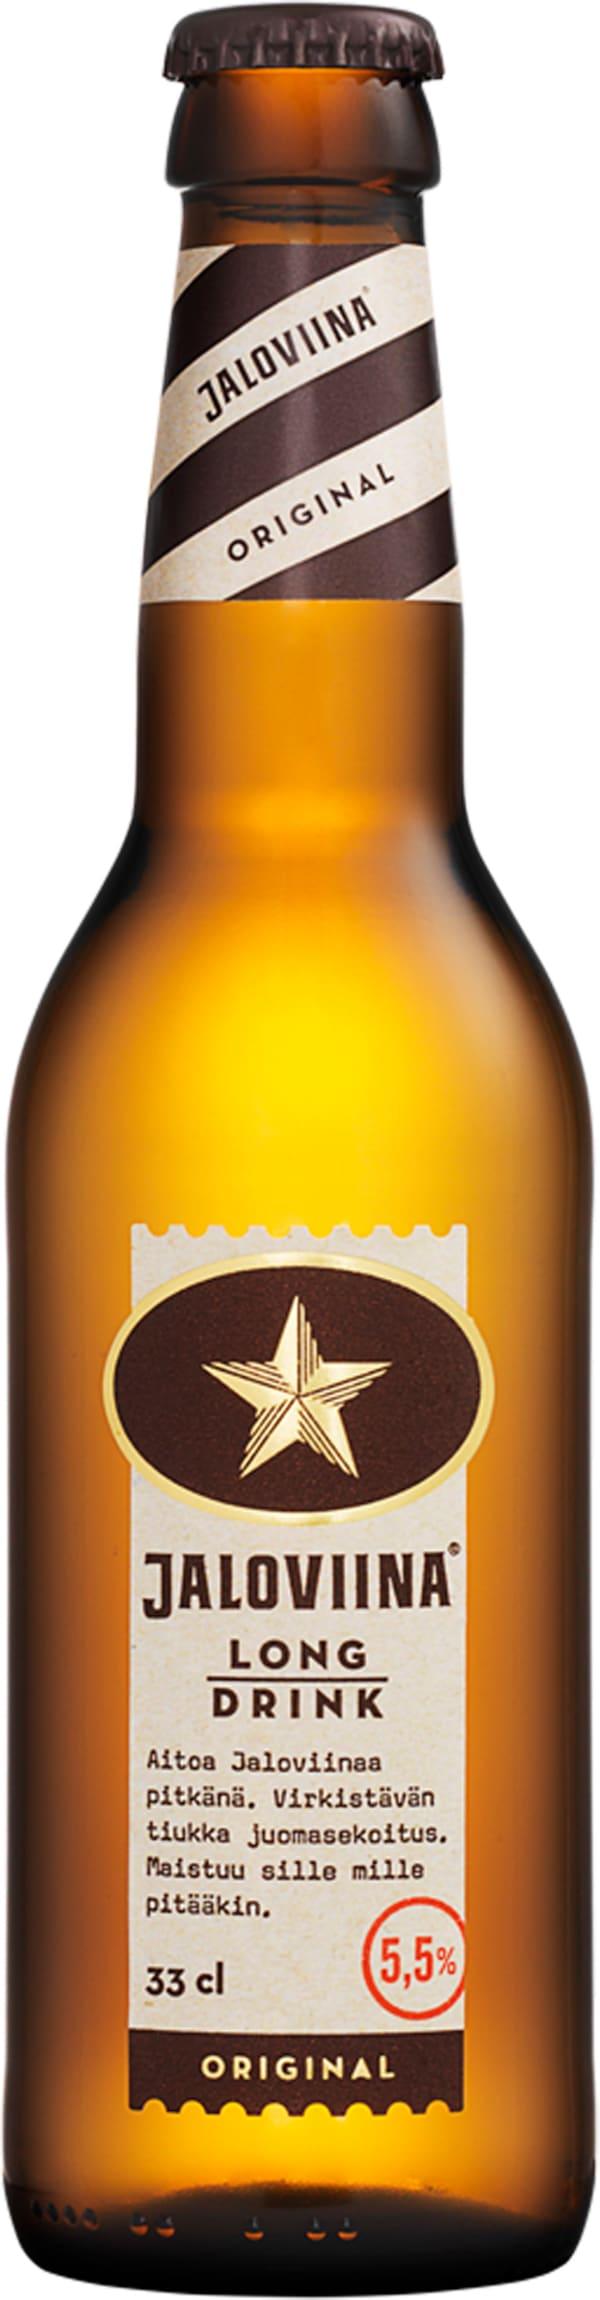 Jaloviina Original Long Drink